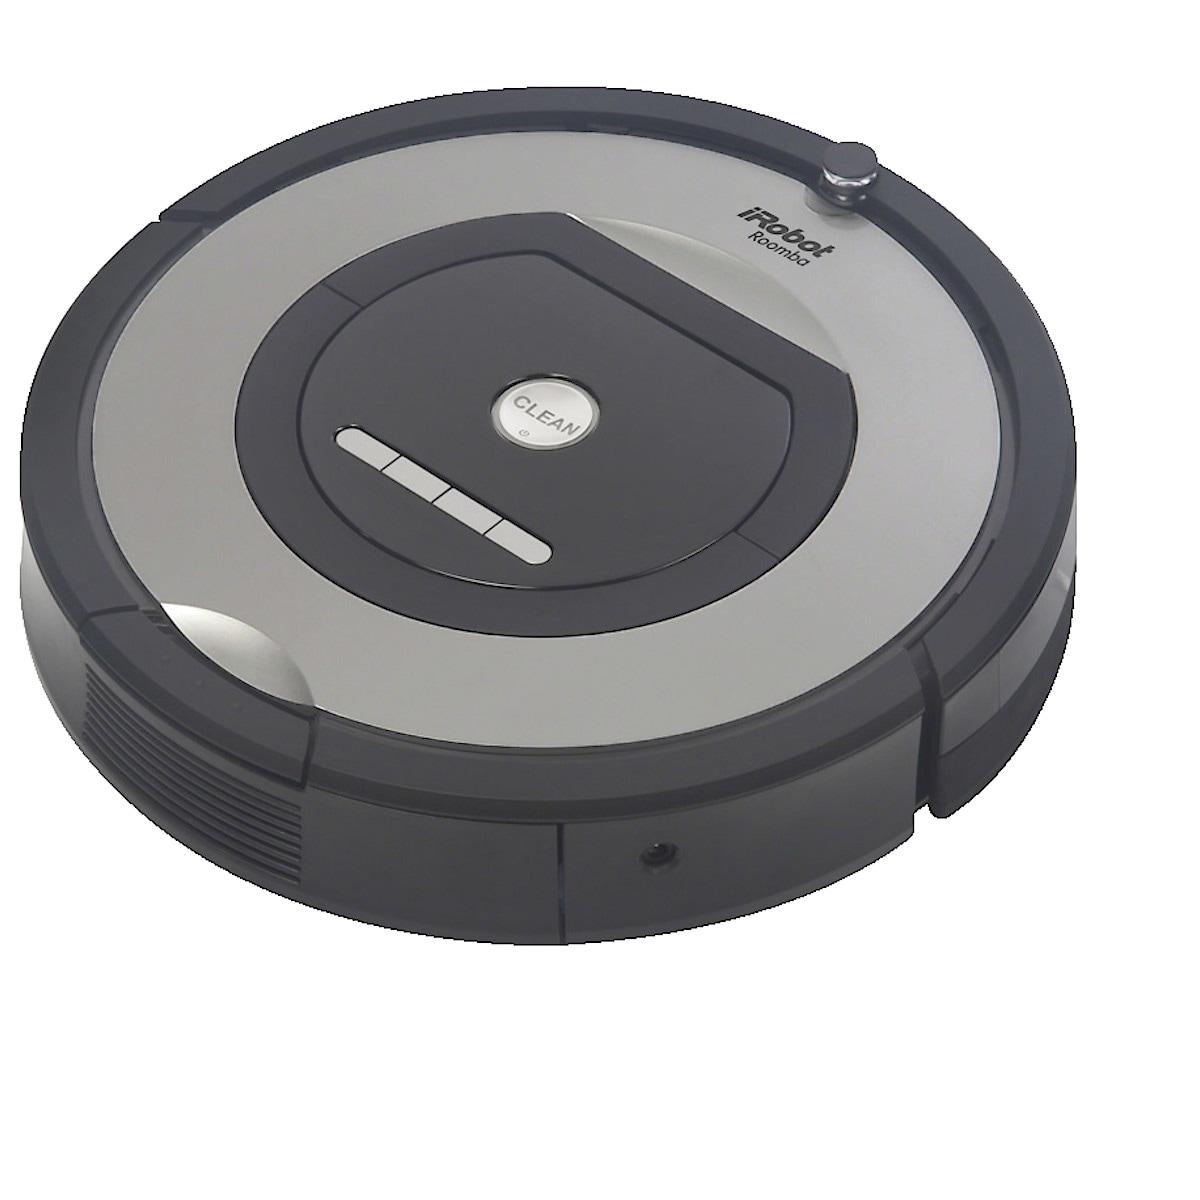 iRobot Roomba 772, robotstøvsuger